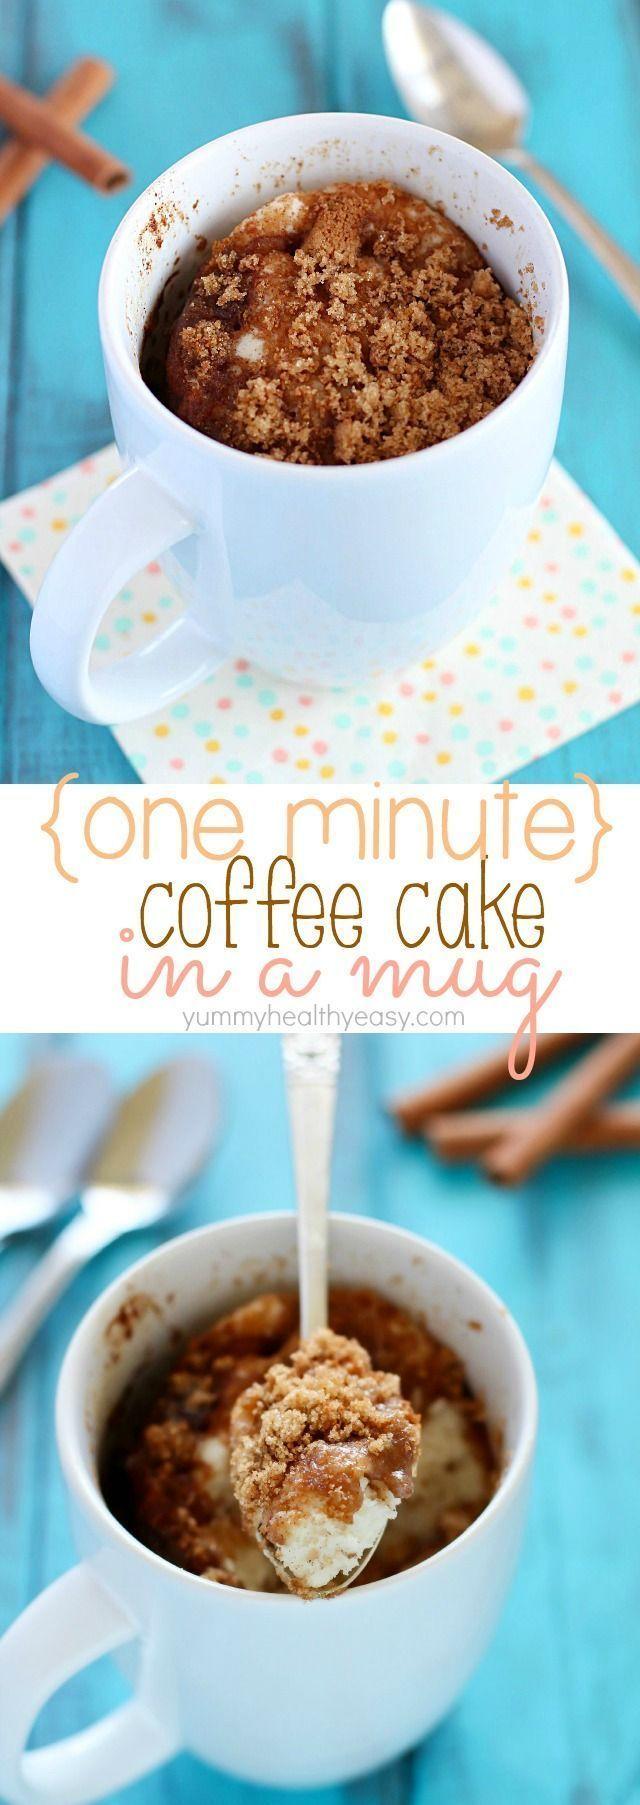 Easy To Make Microwave Coffee Cake